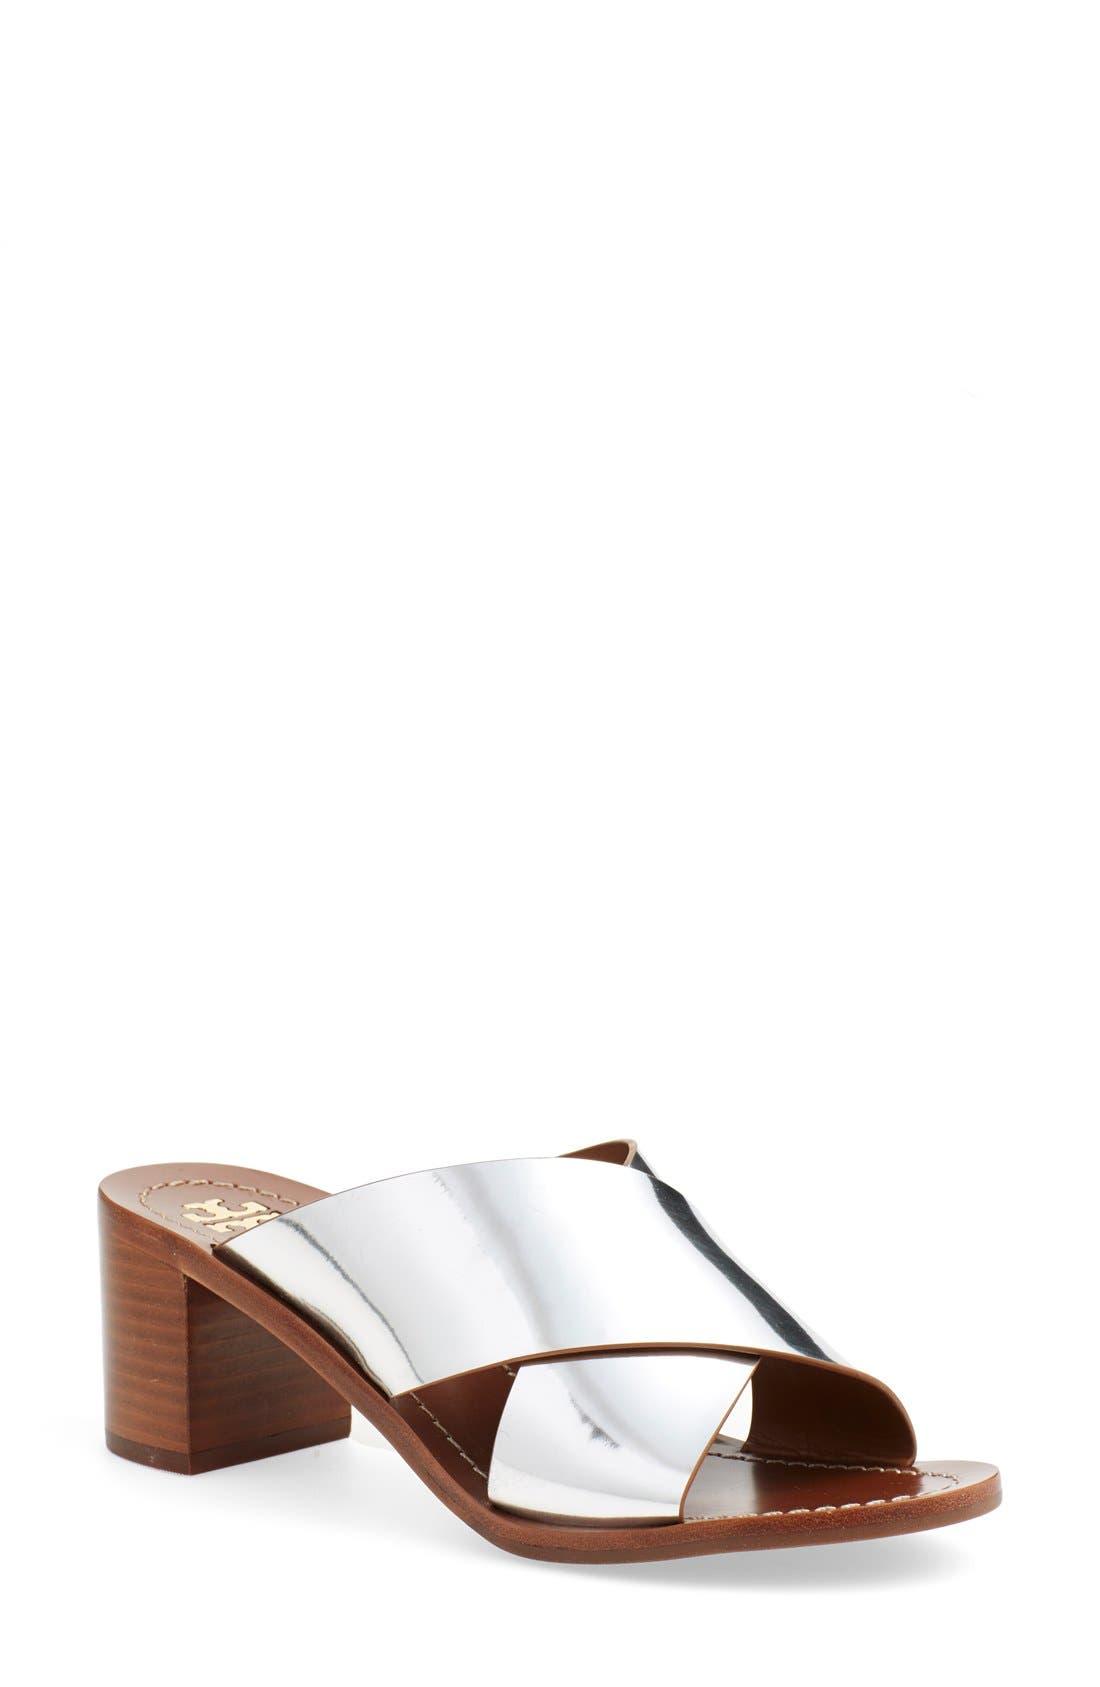 'Montrose' Sandal,                             Main thumbnail 1, color,                             045